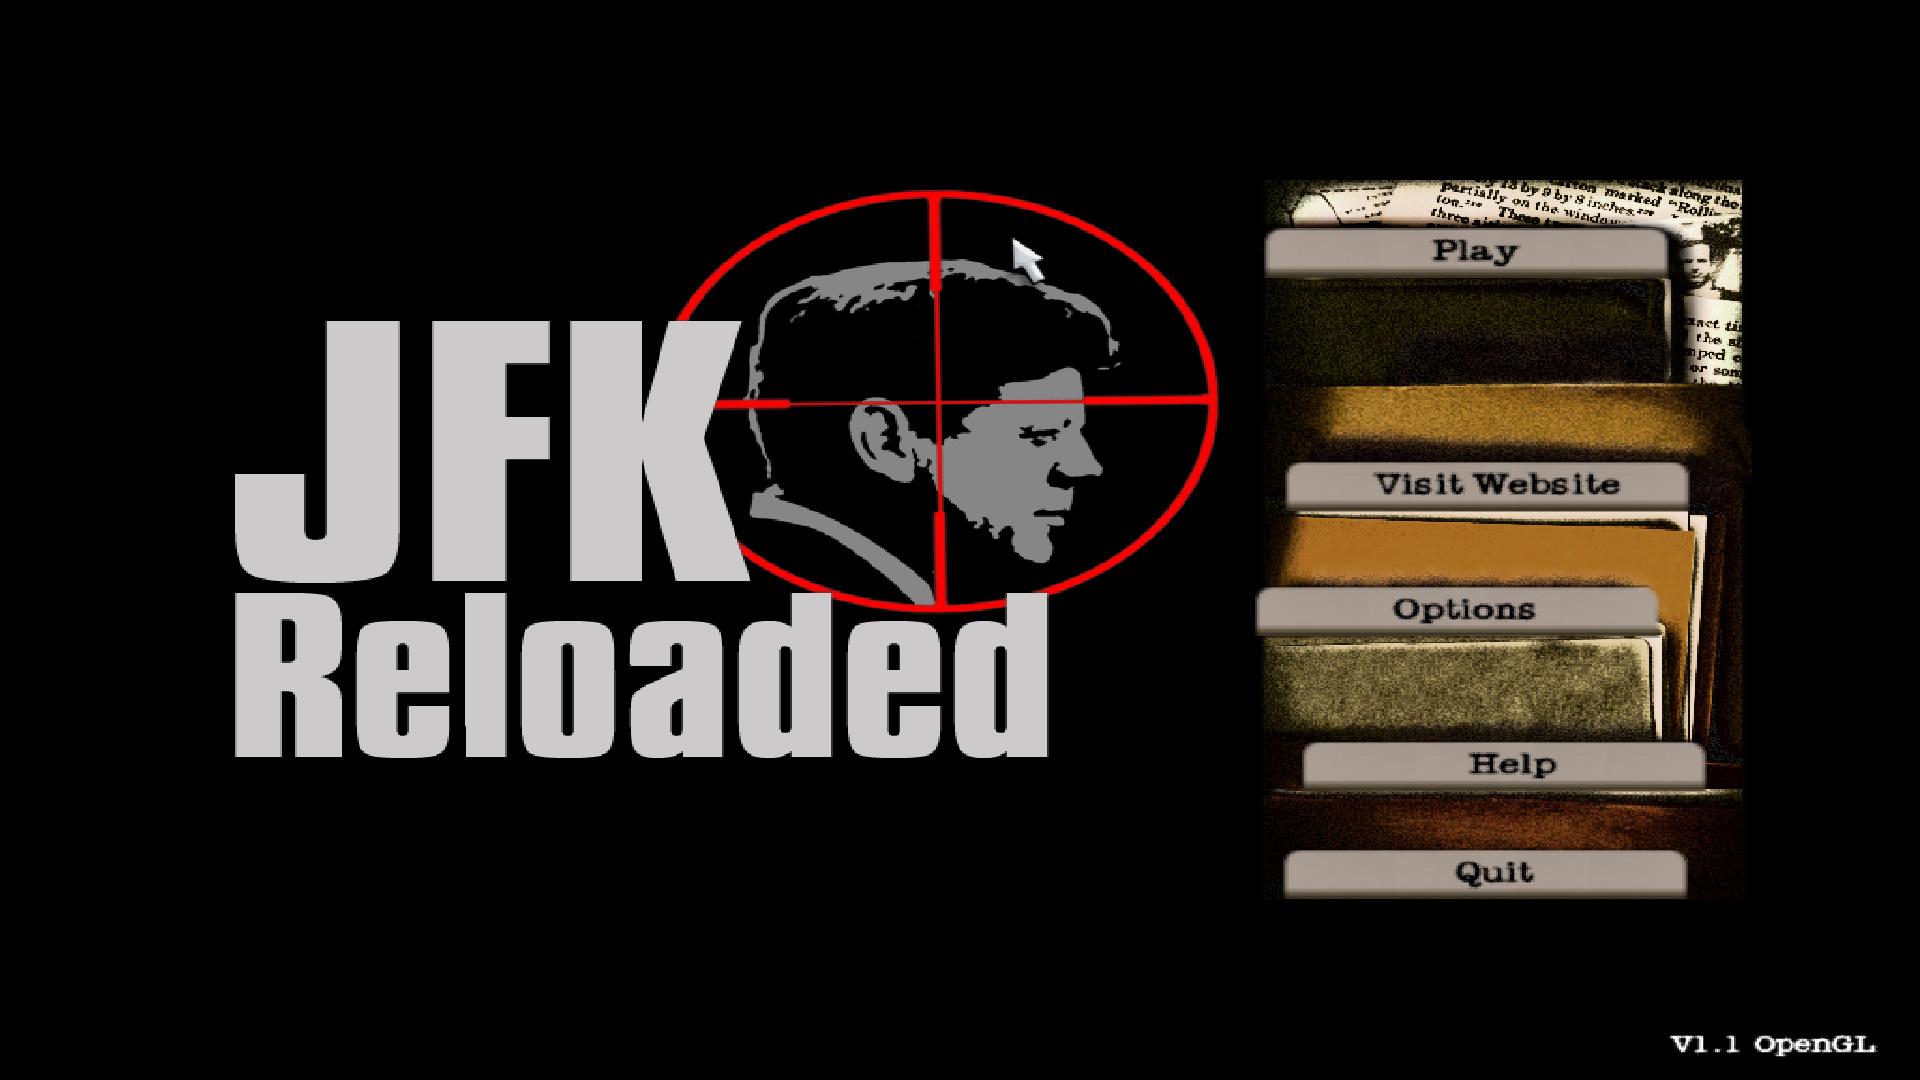 Download jfk reloaded (windows) my abandonware.